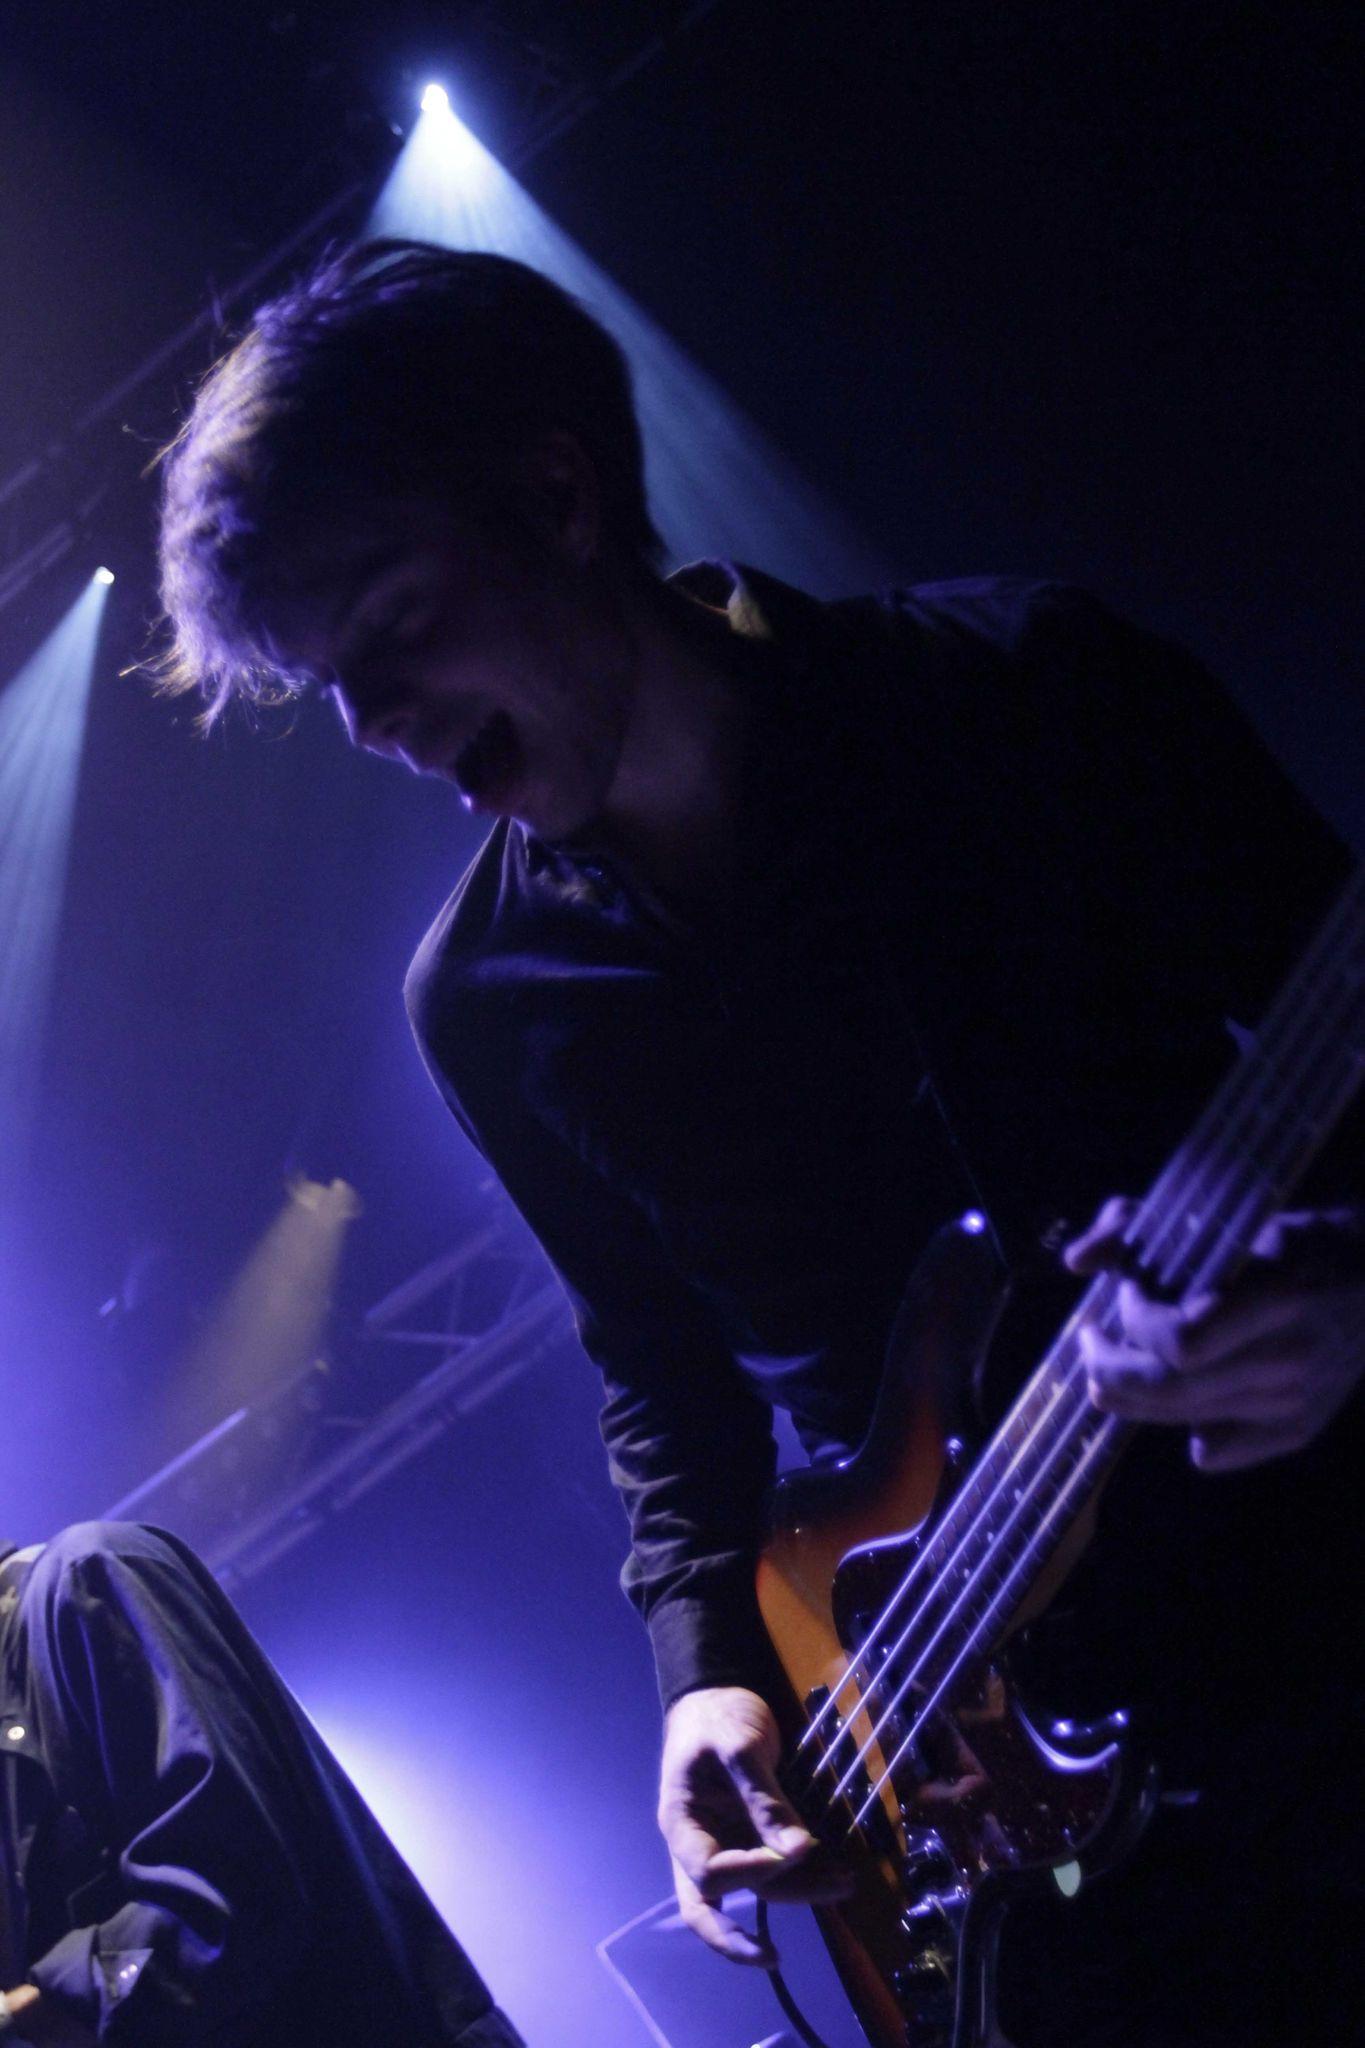 StellarDog-Tour2Chauffe-Nautilys-2012-63